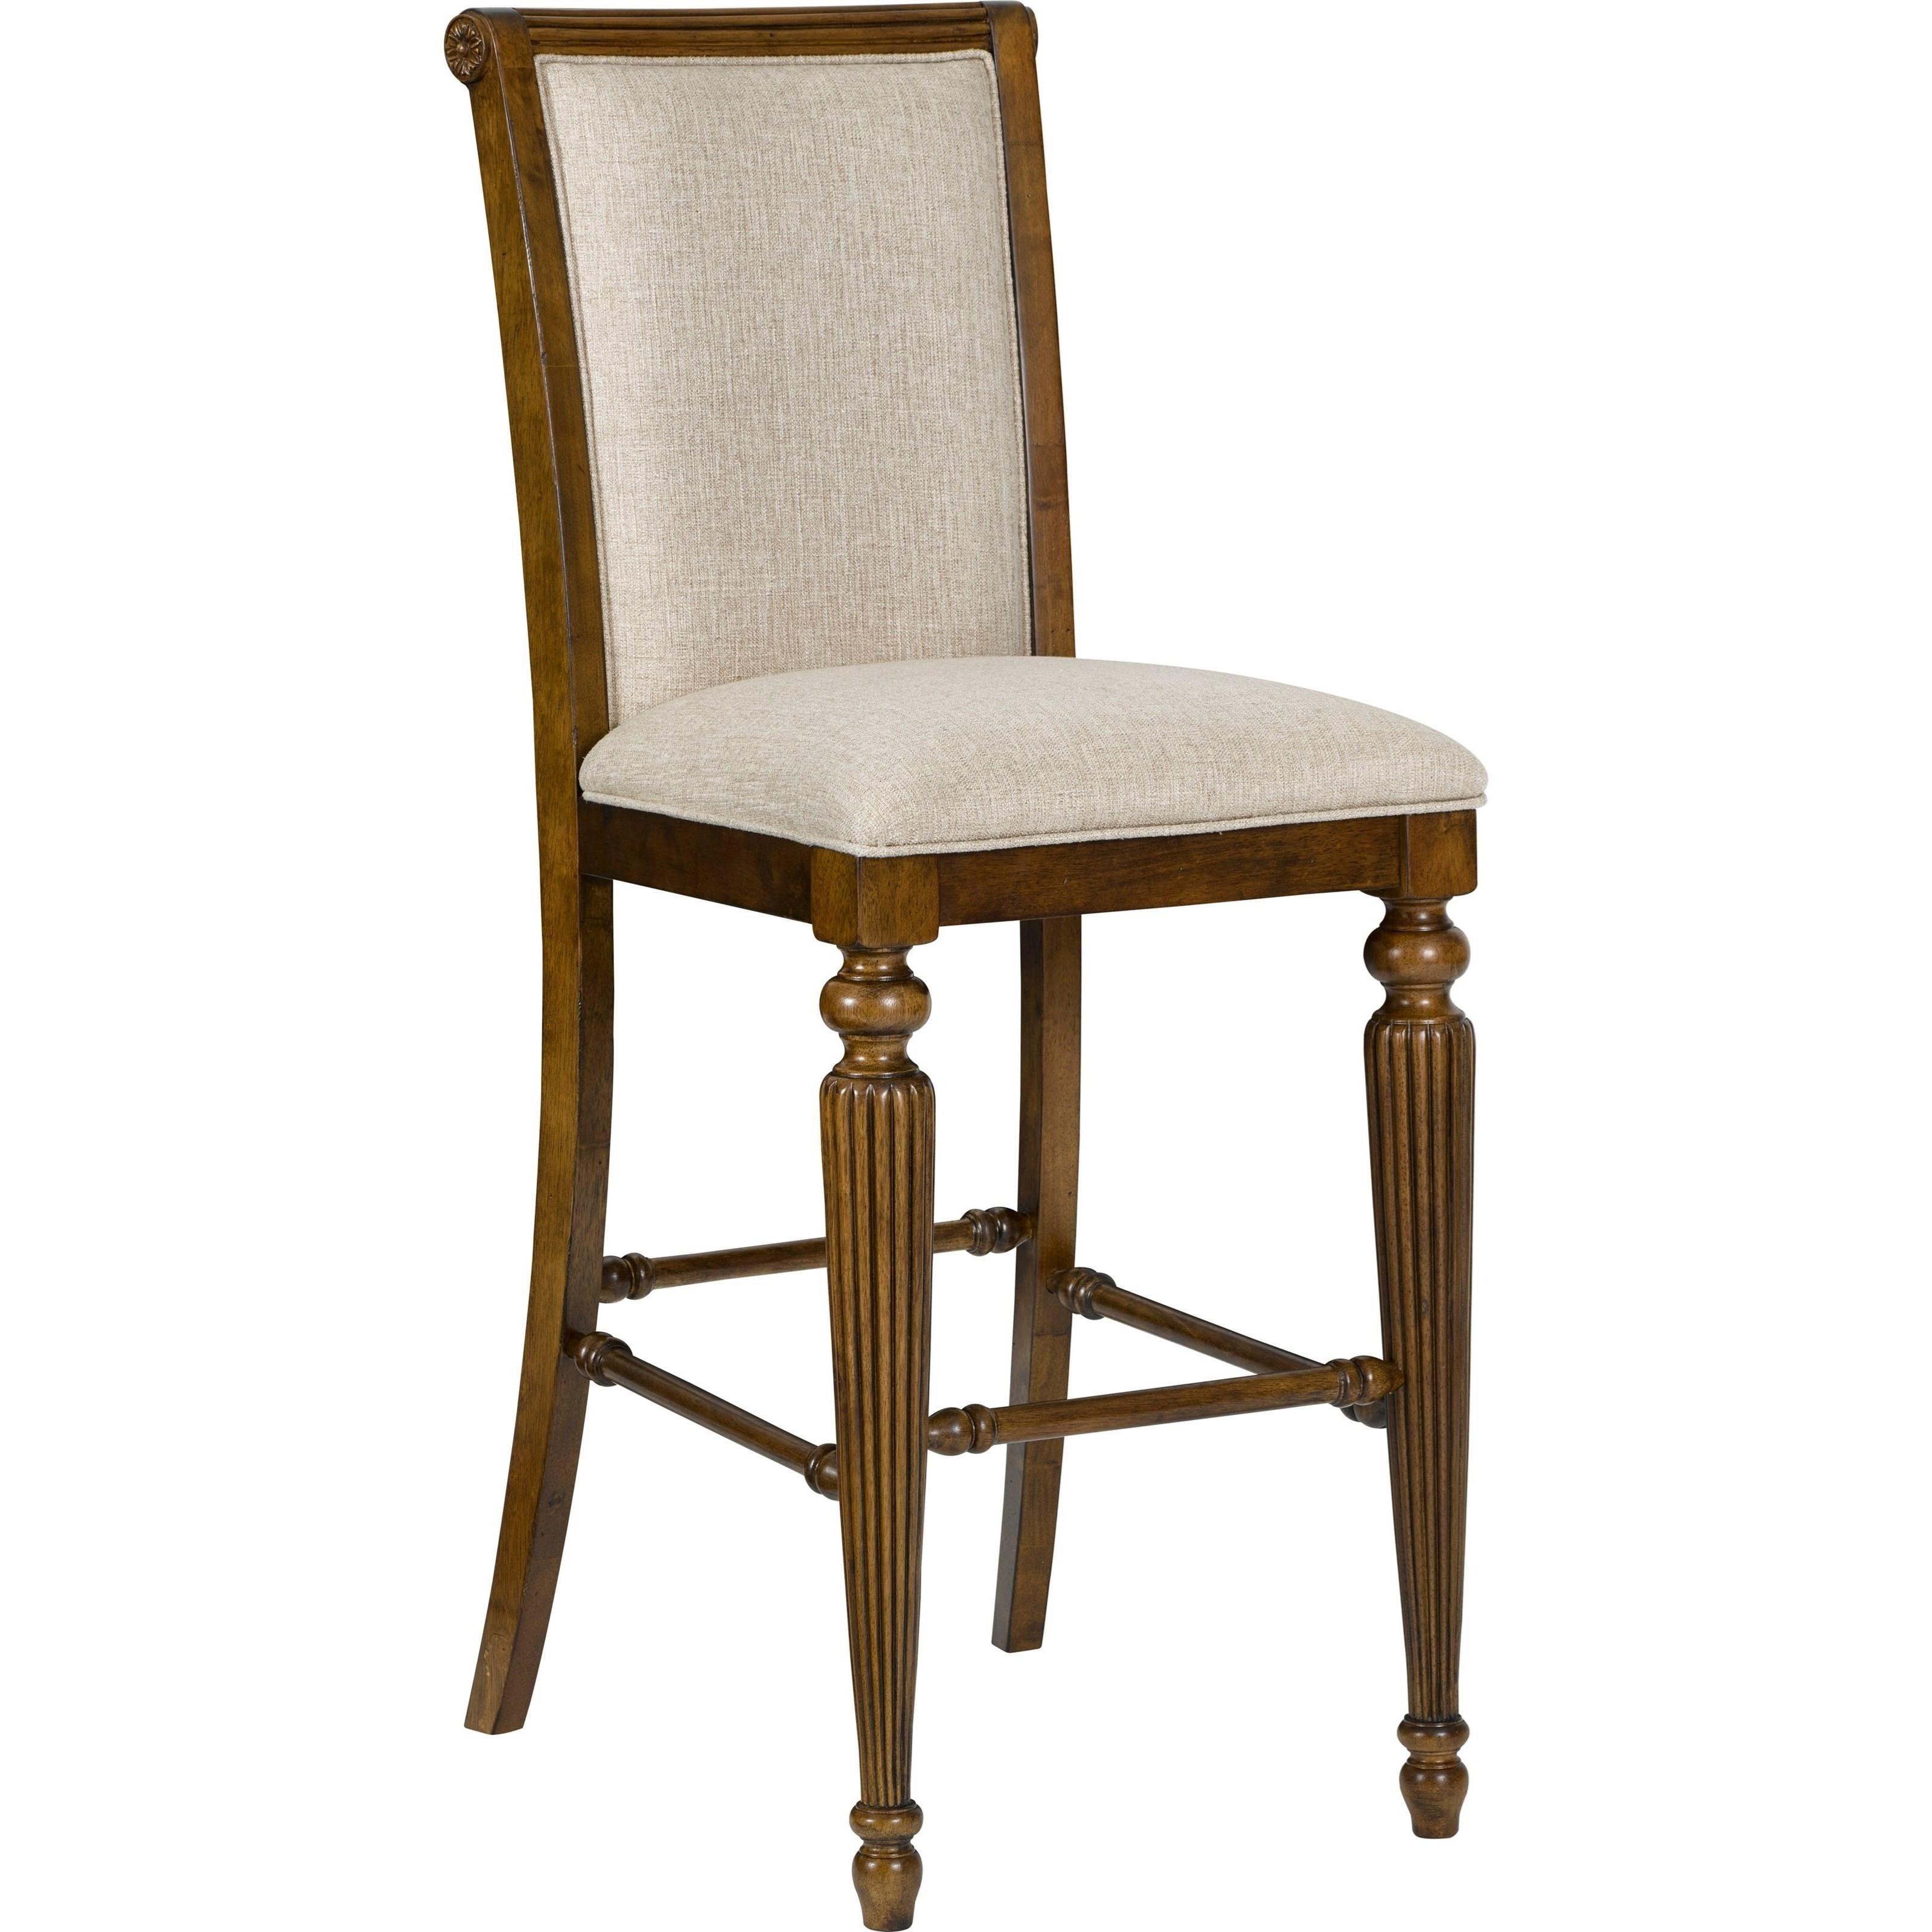 Broyhill Furniture Amalie Bay Upholstered Pub Stool - Item Number: 4548-591